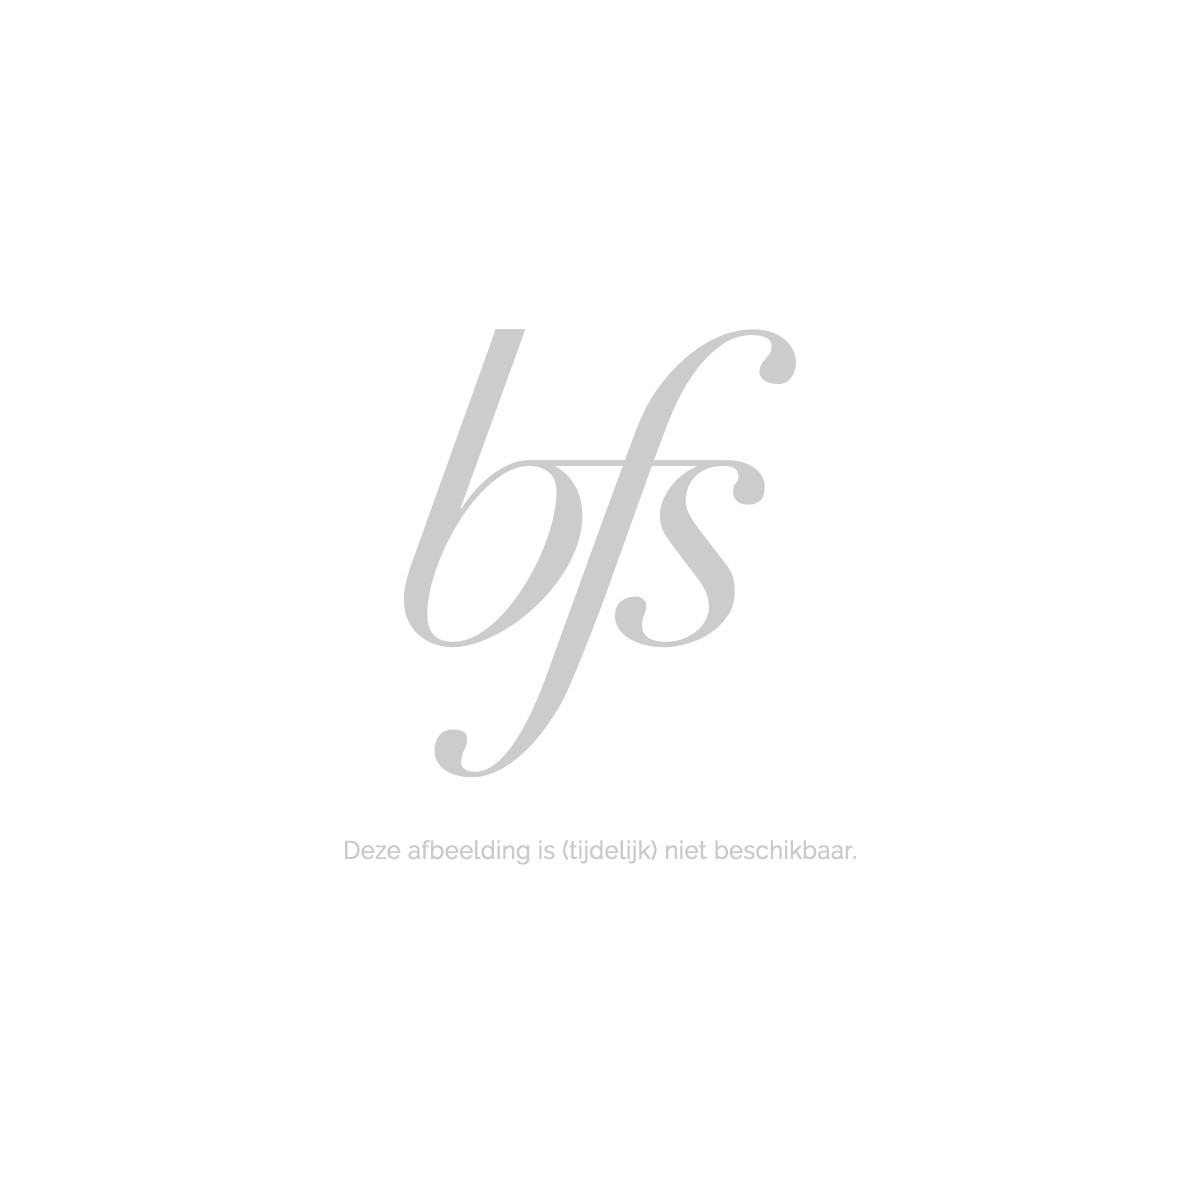 Babyliss Krultang Titanium Tourmaline Ceramic 25Mm